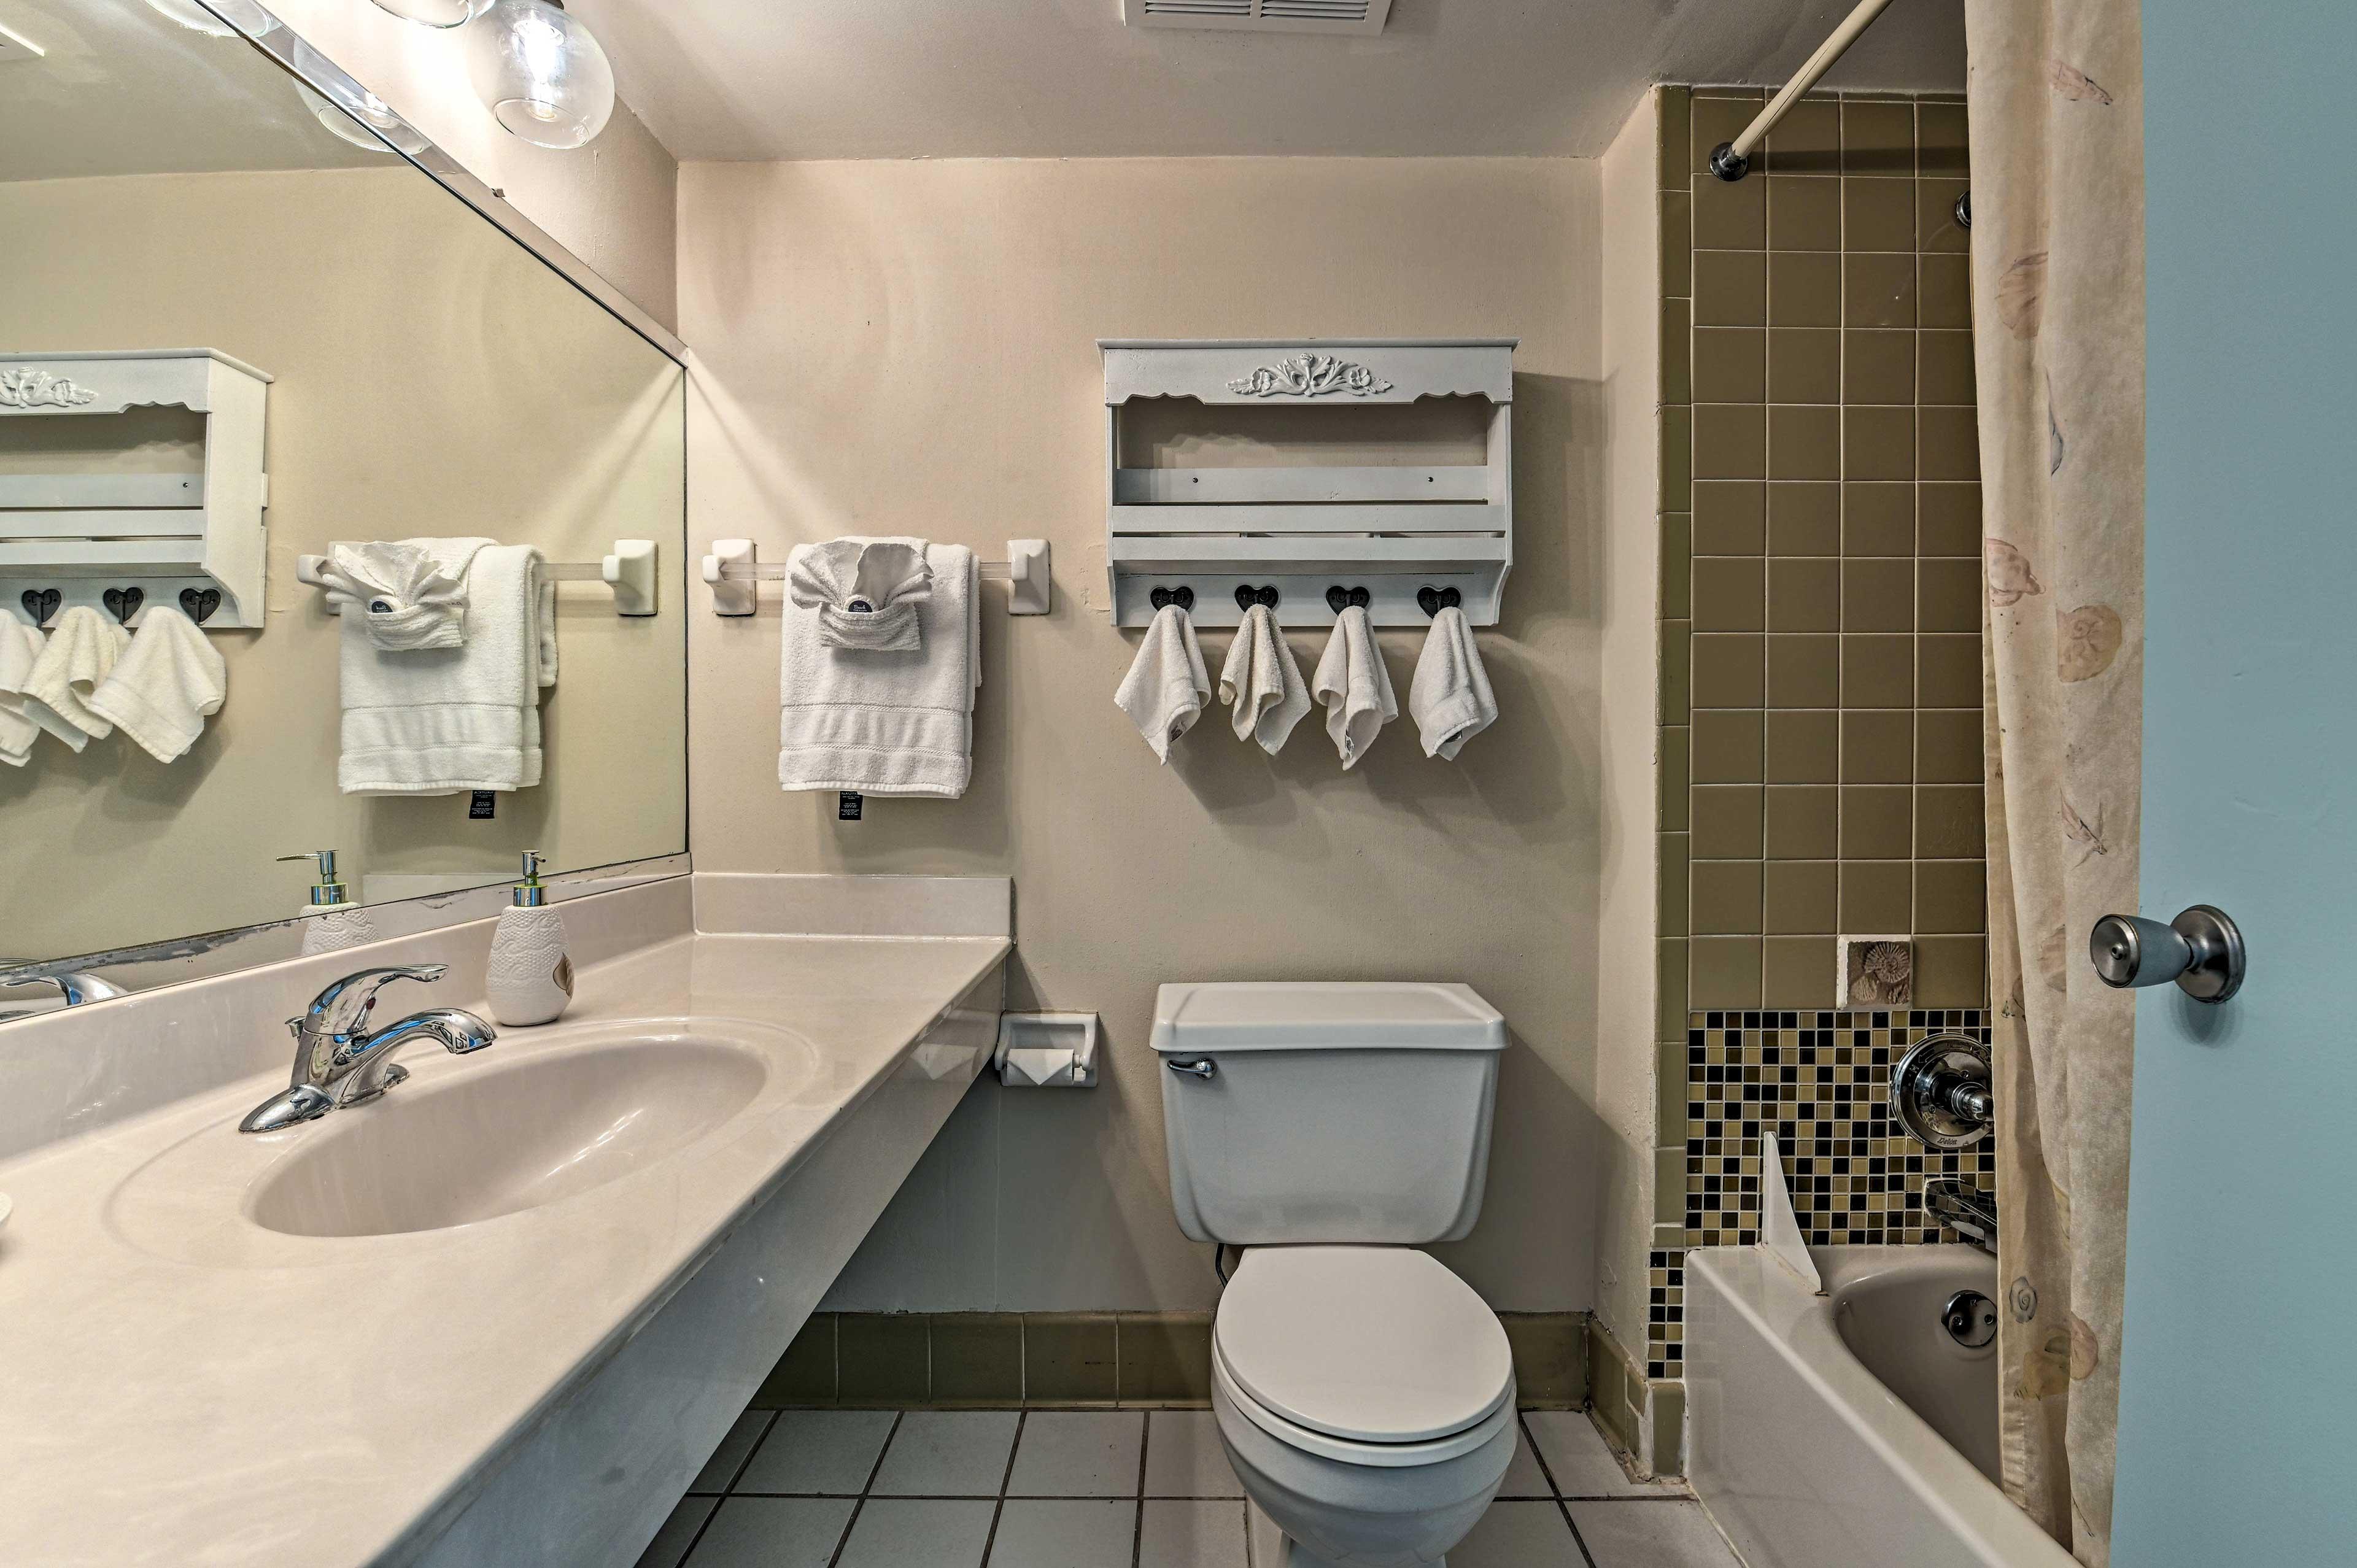 The unit has 1 pristine bathroom.